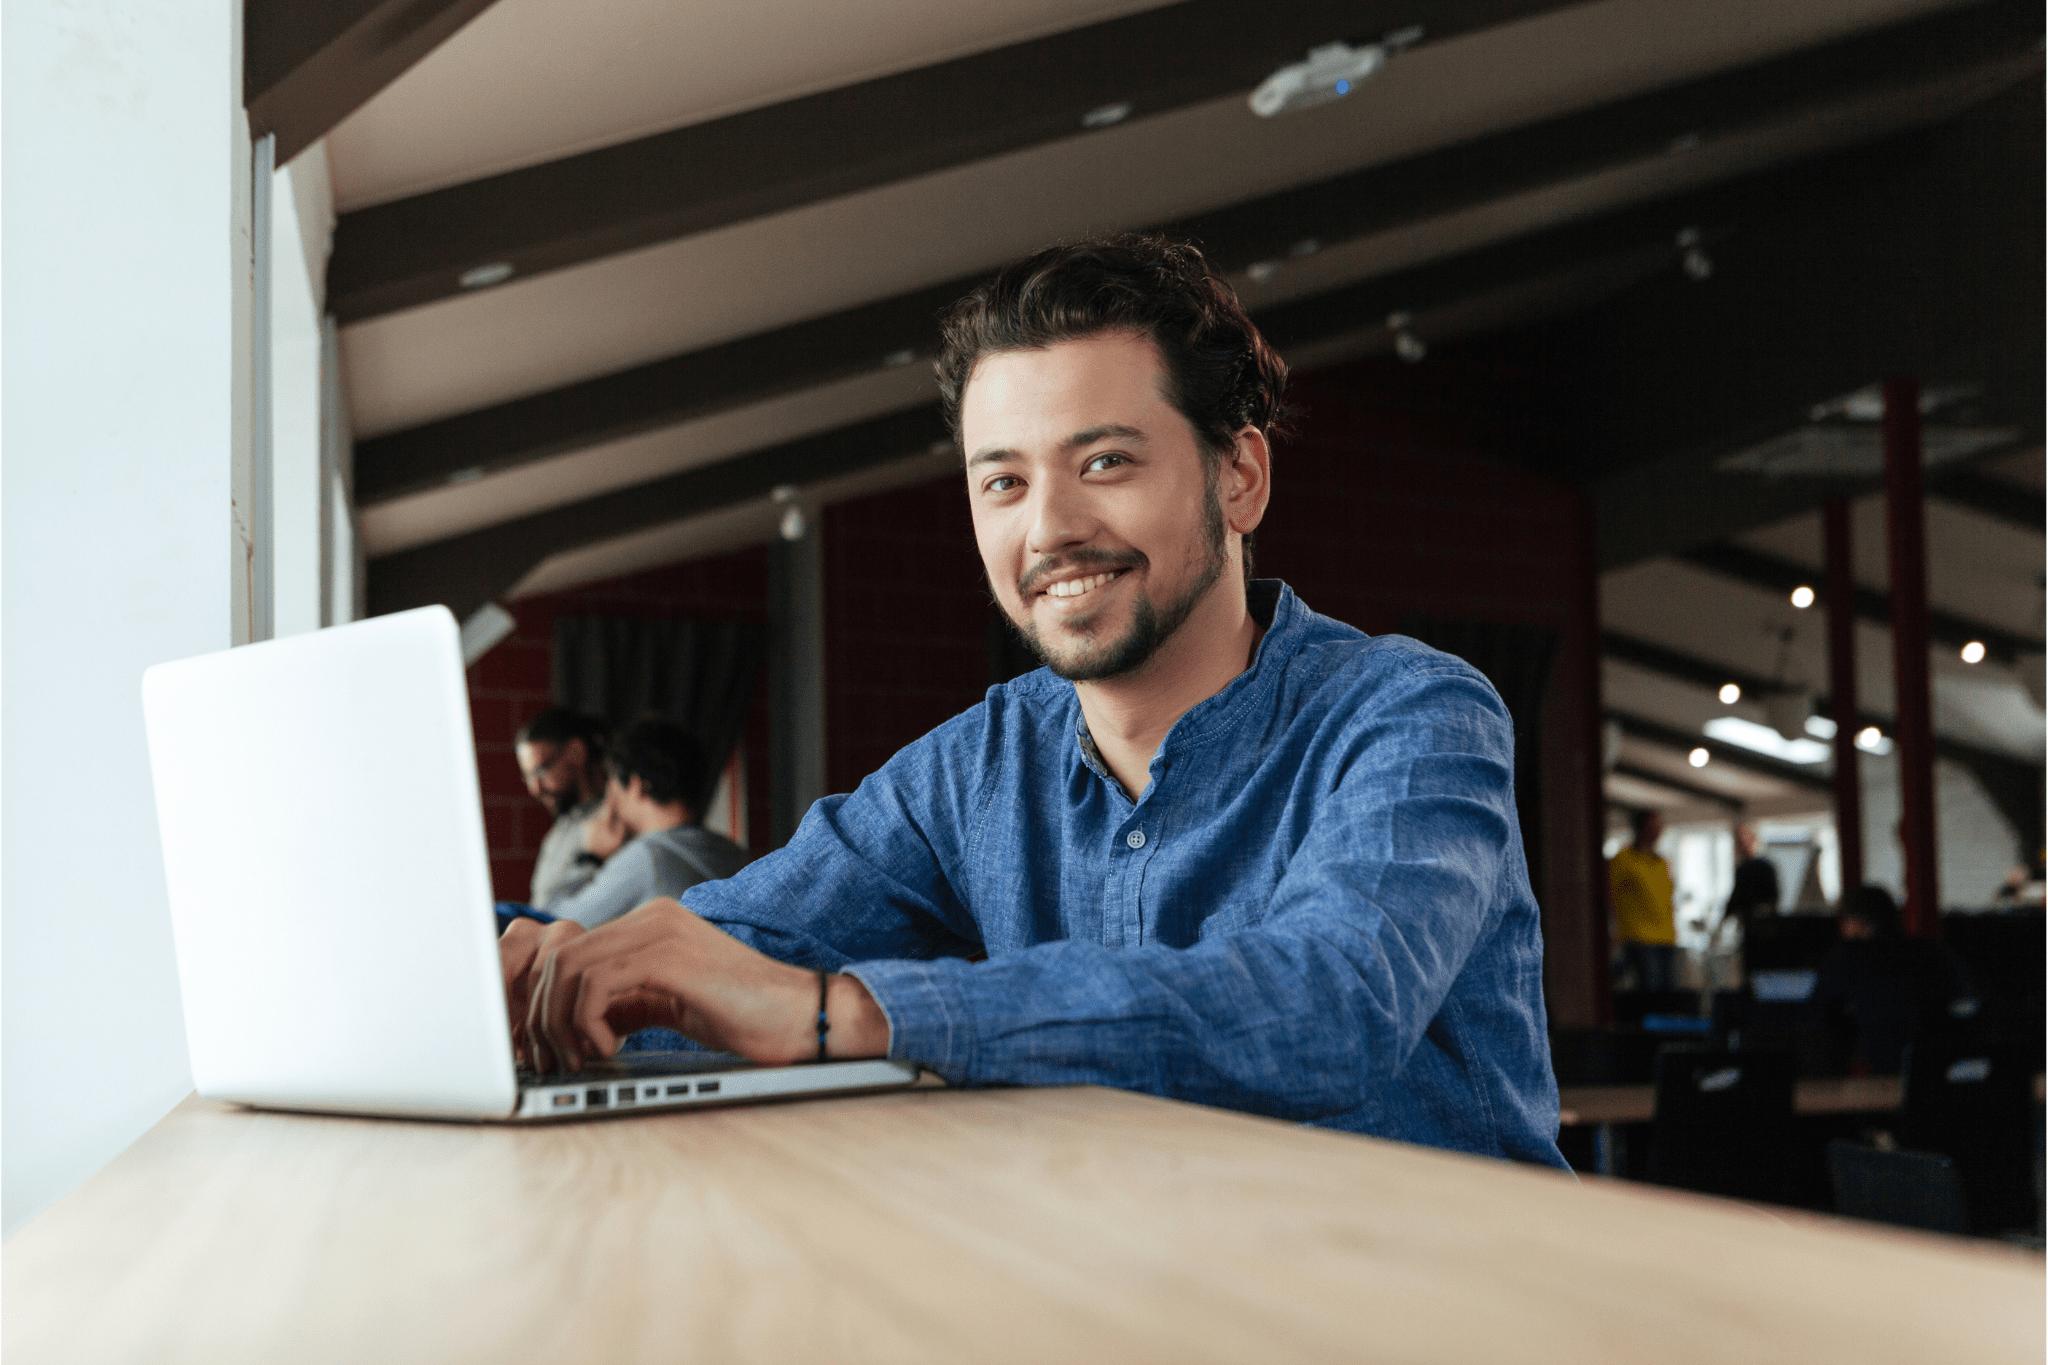 Der perfekte LinkedIn Post: 3+1 clevere Praxistipps Machen! Magazin